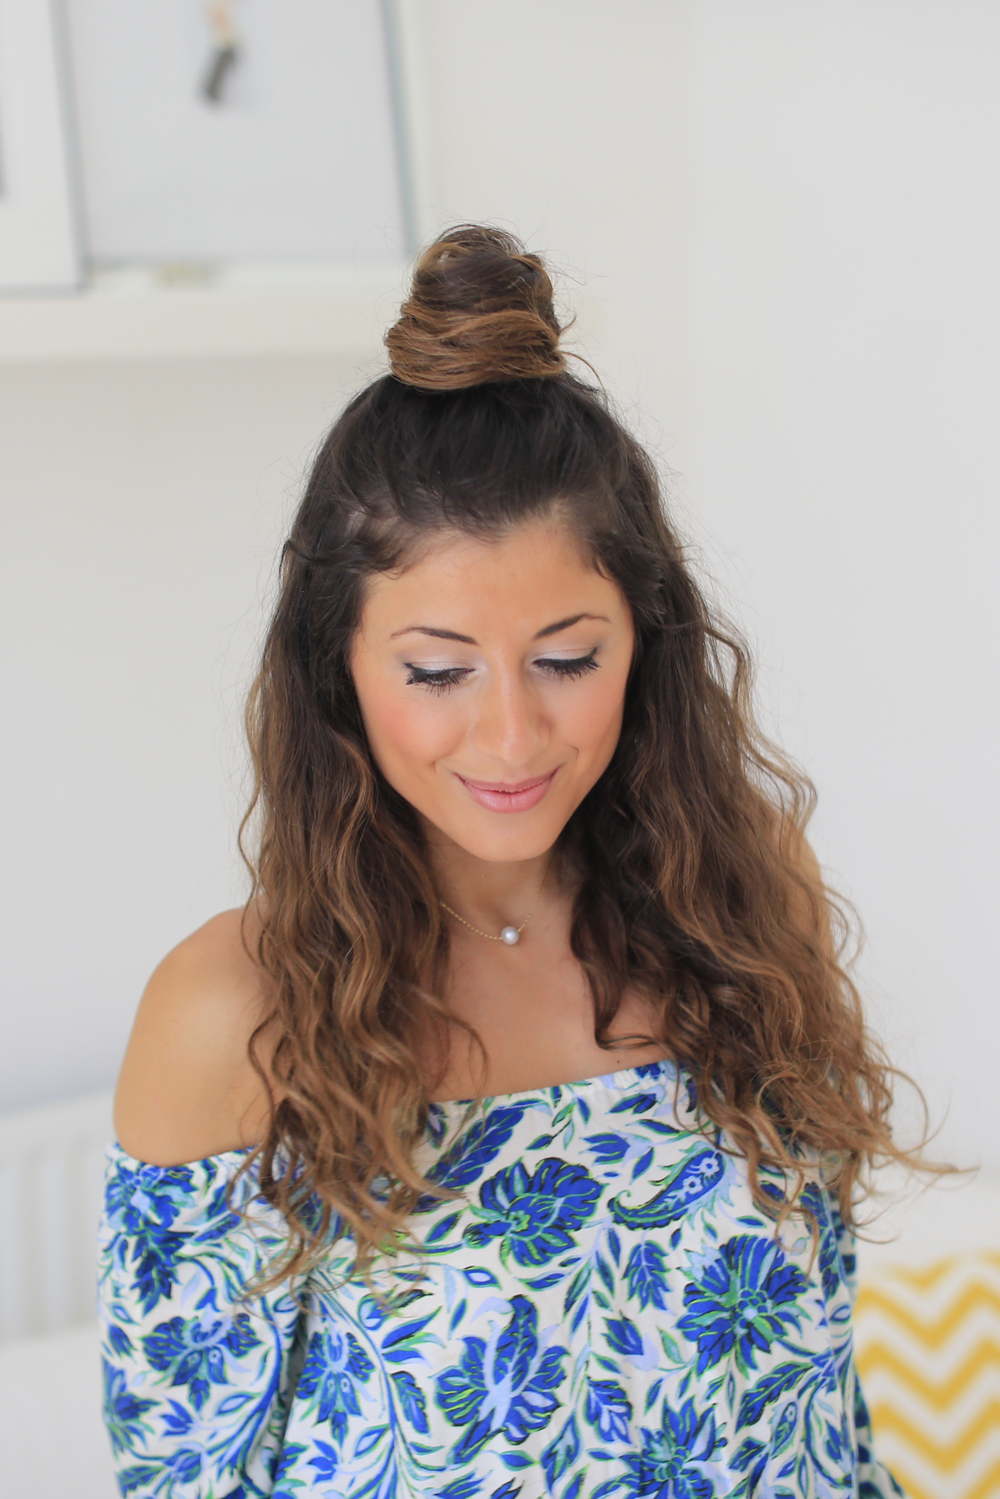 Sensational Easy Hairstyles For Curly Hair Luxy Hair Short Hairstyles For Black Women Fulllsitofus